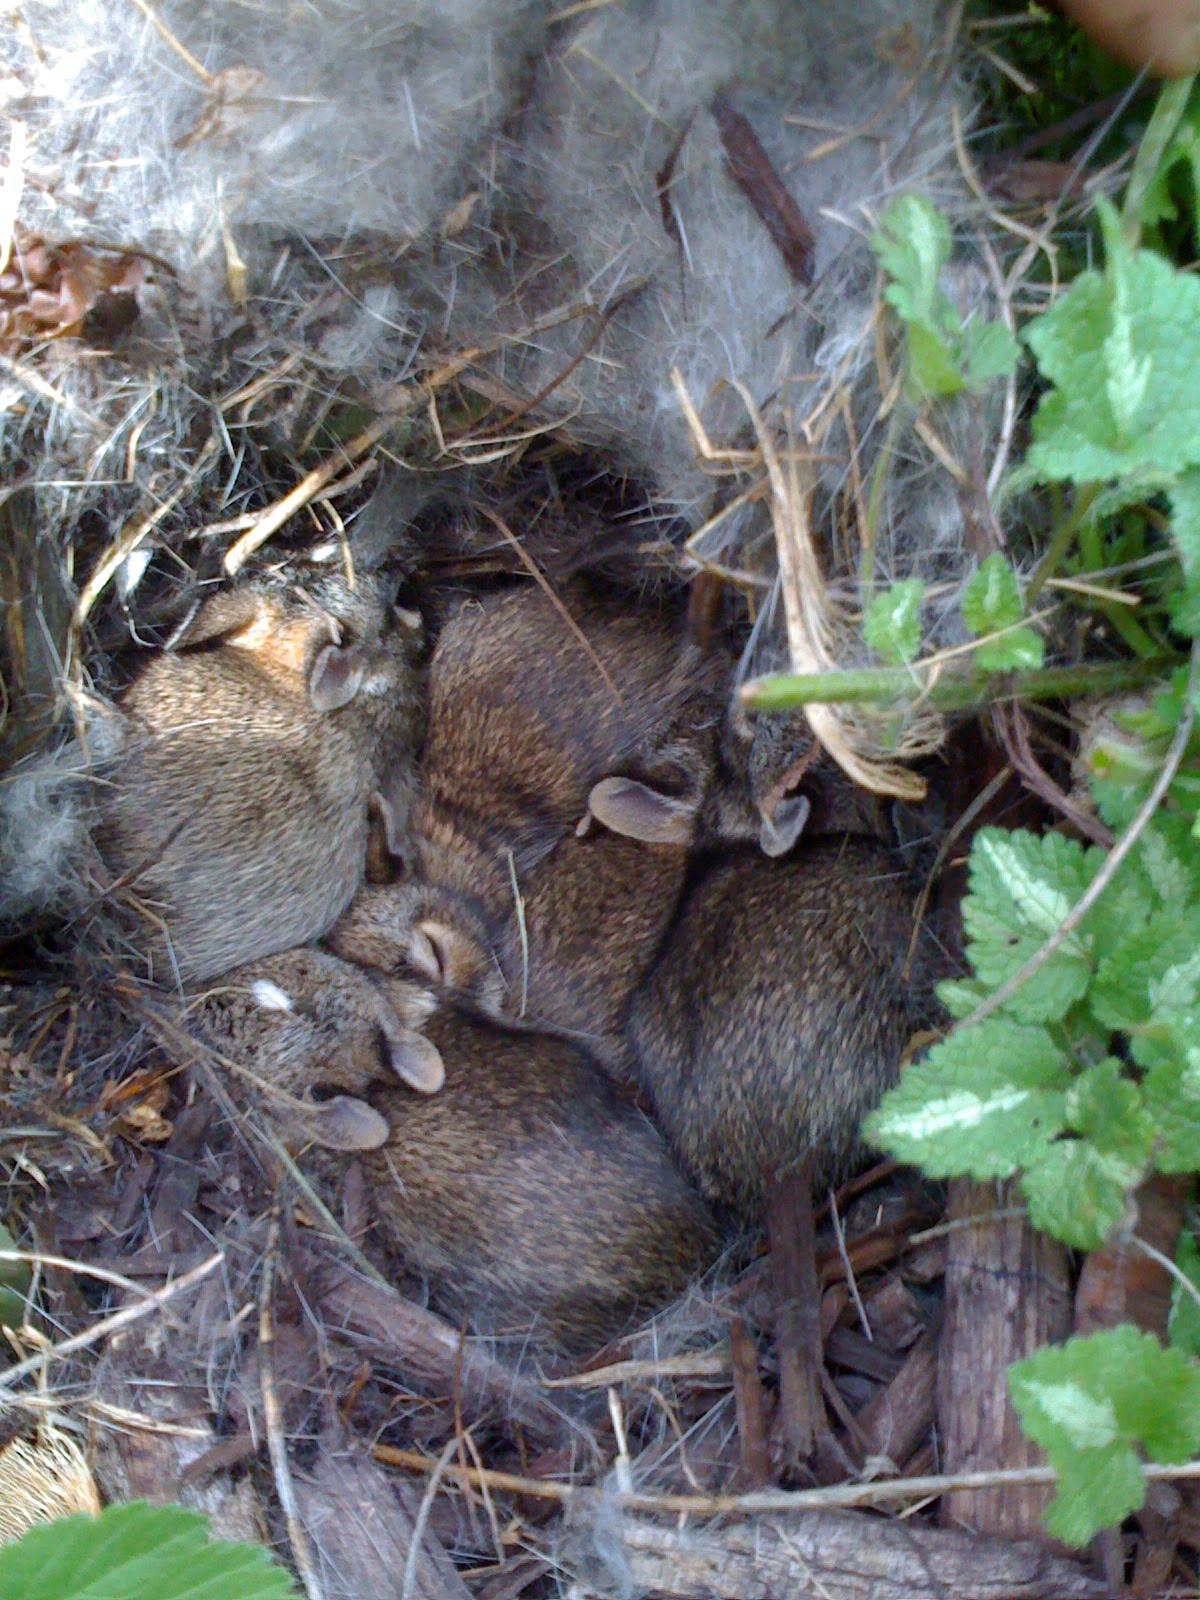 Our Garden Path Baby Bunny Nest Found